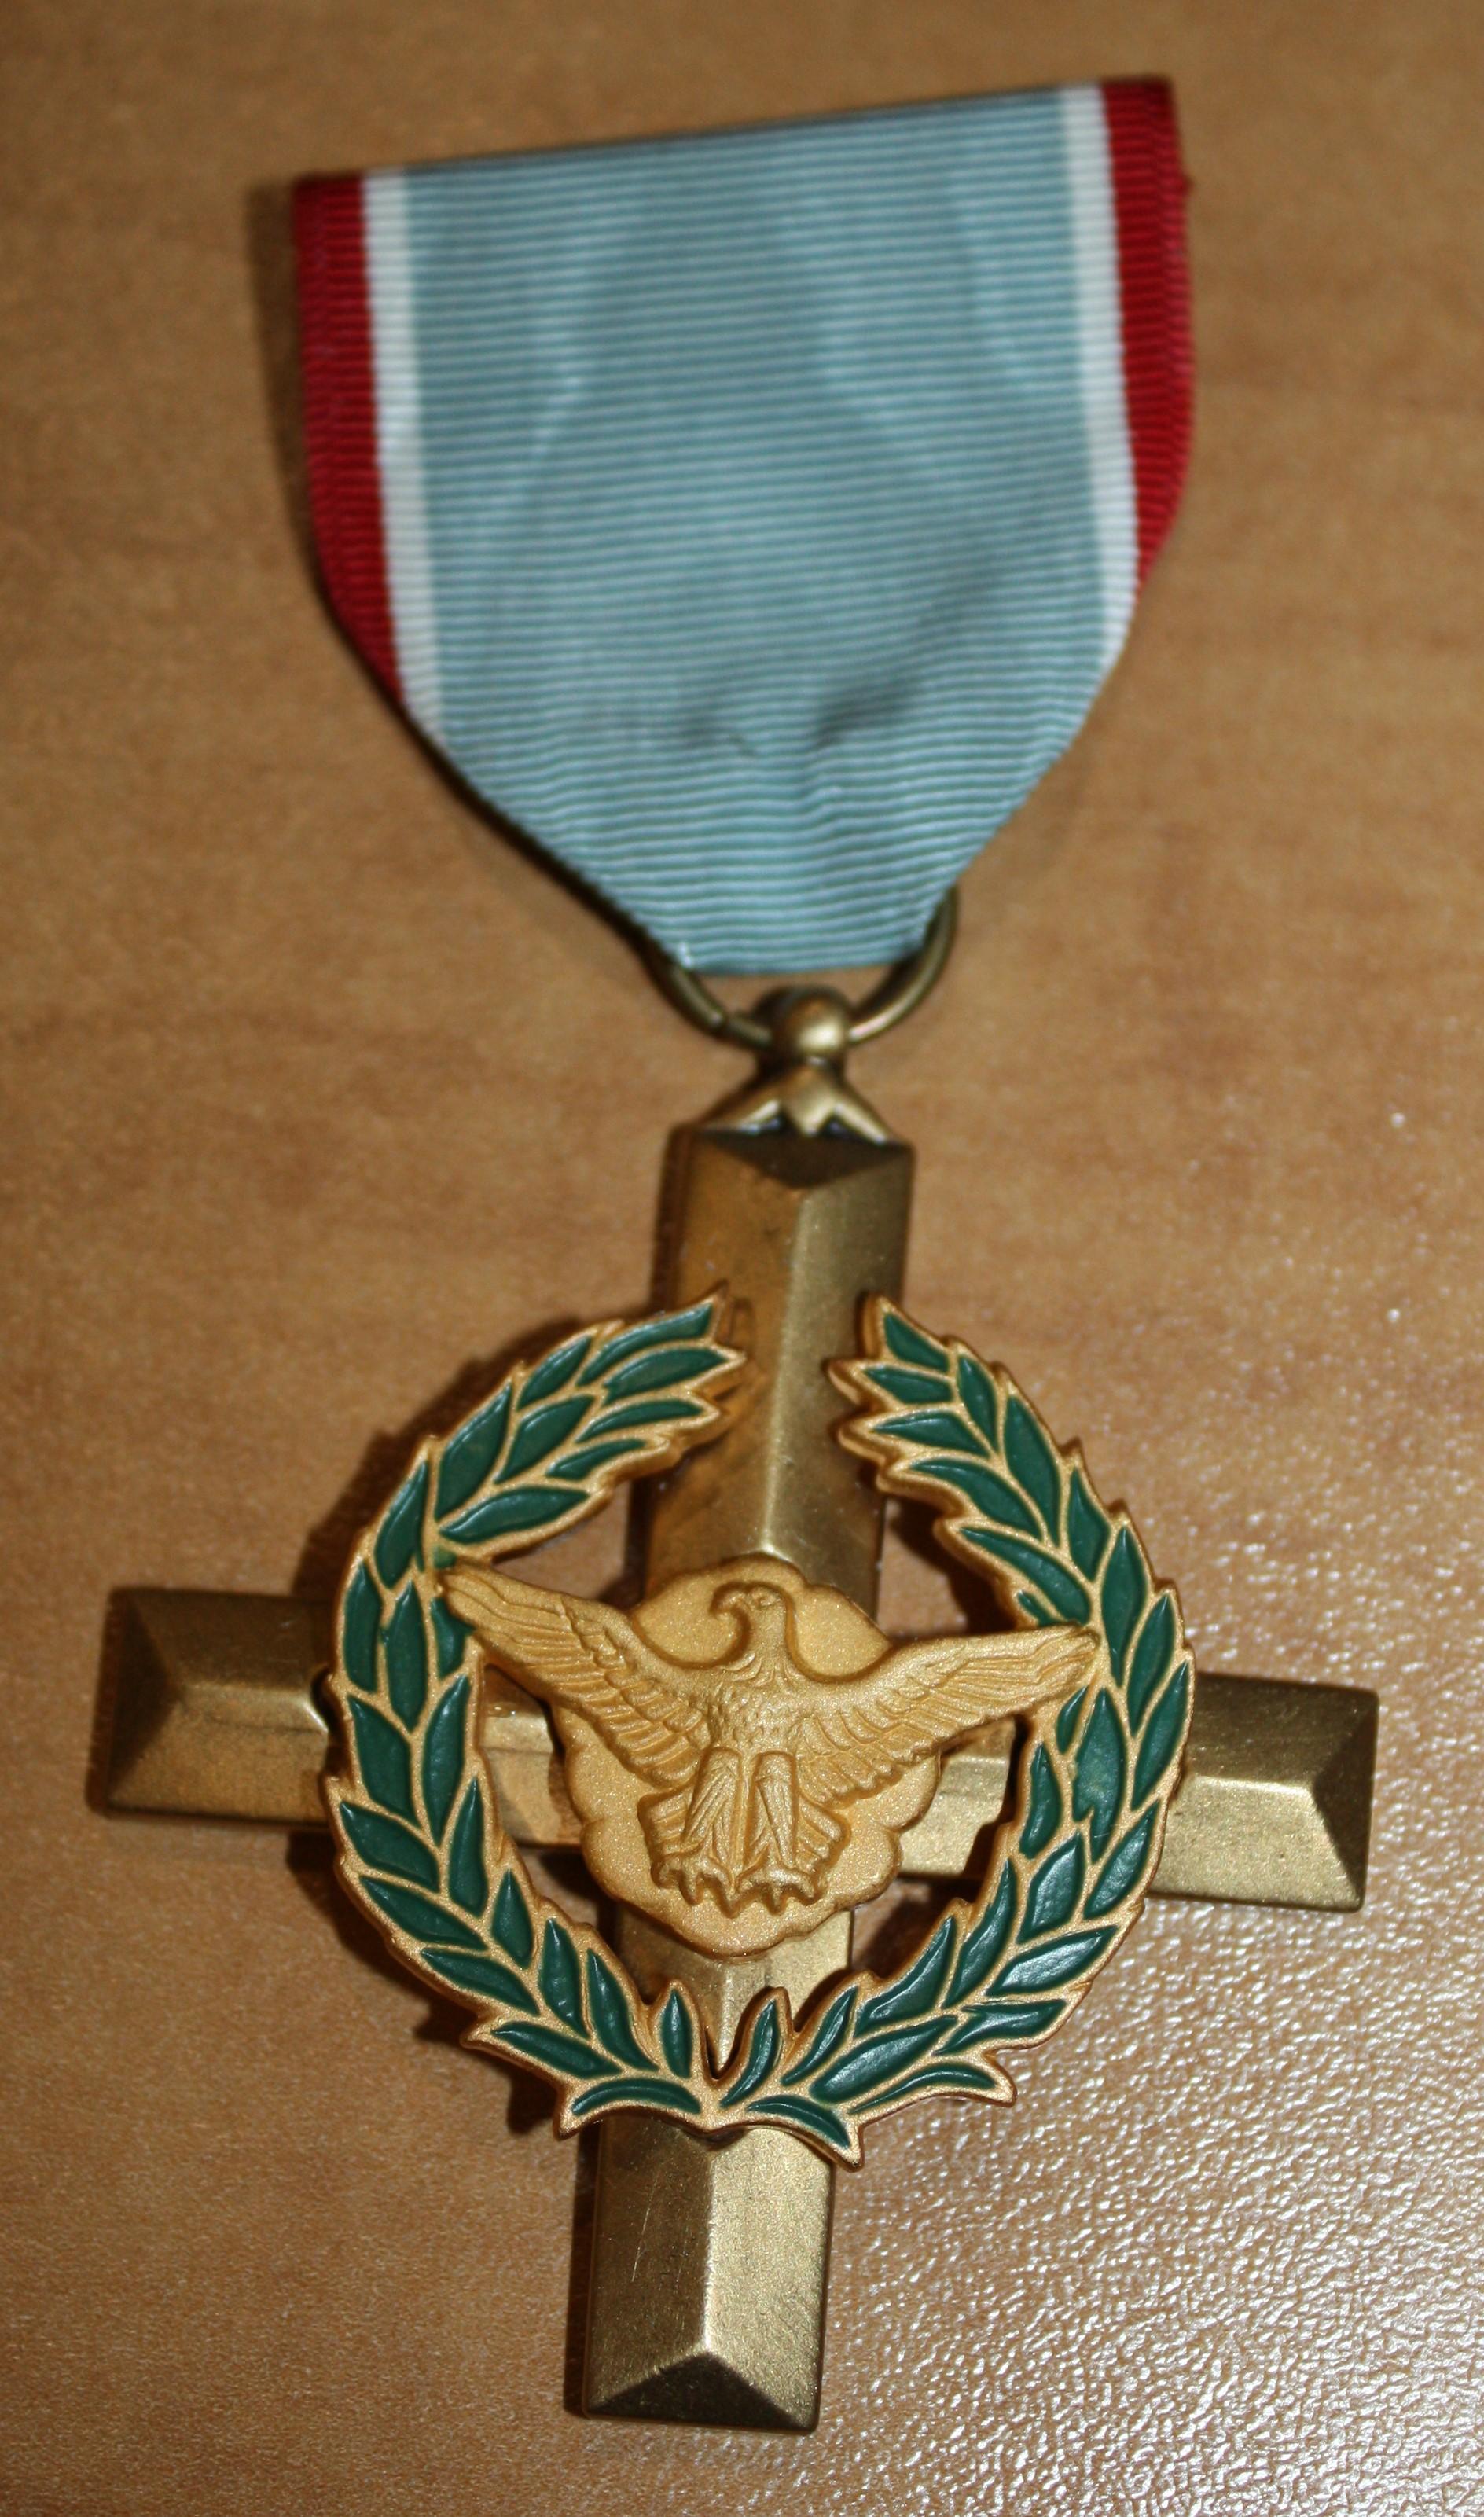 U.S. Air Force Medals - MilitaryVetsPX.com